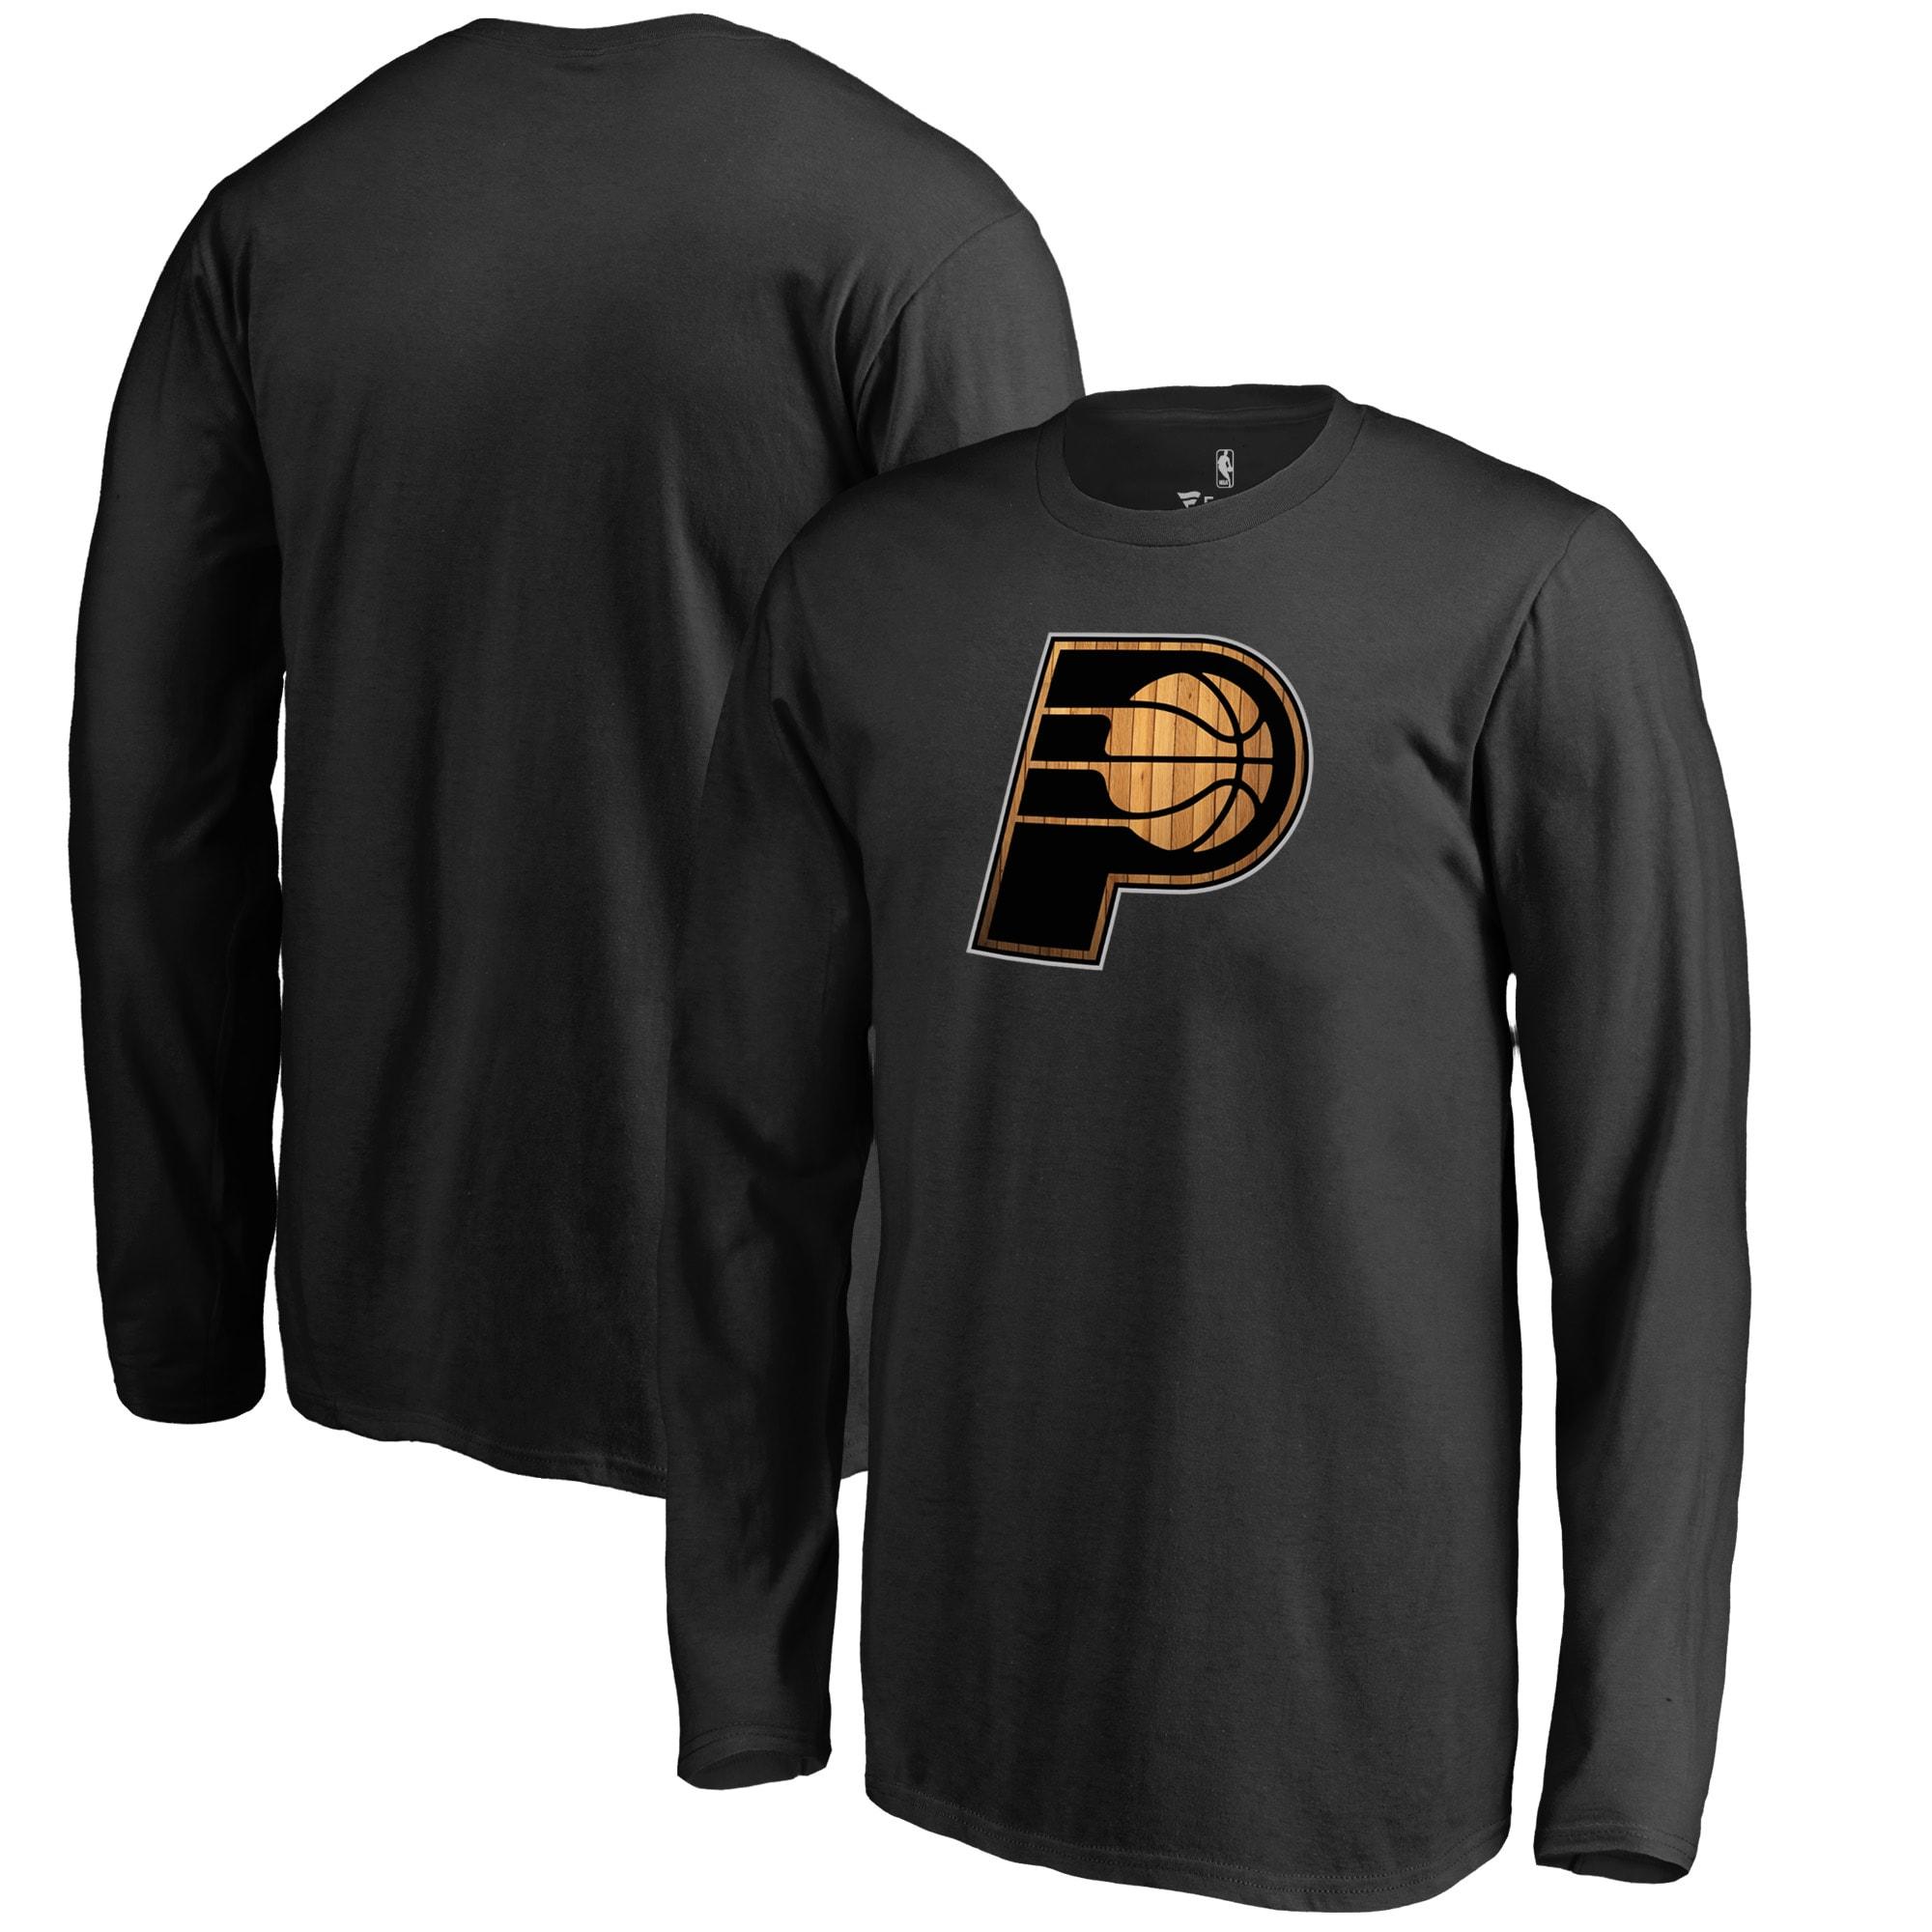 Indiana Pacers Fanatics Branded Youth Hardwood Long Sleeve T-Shirt - Black